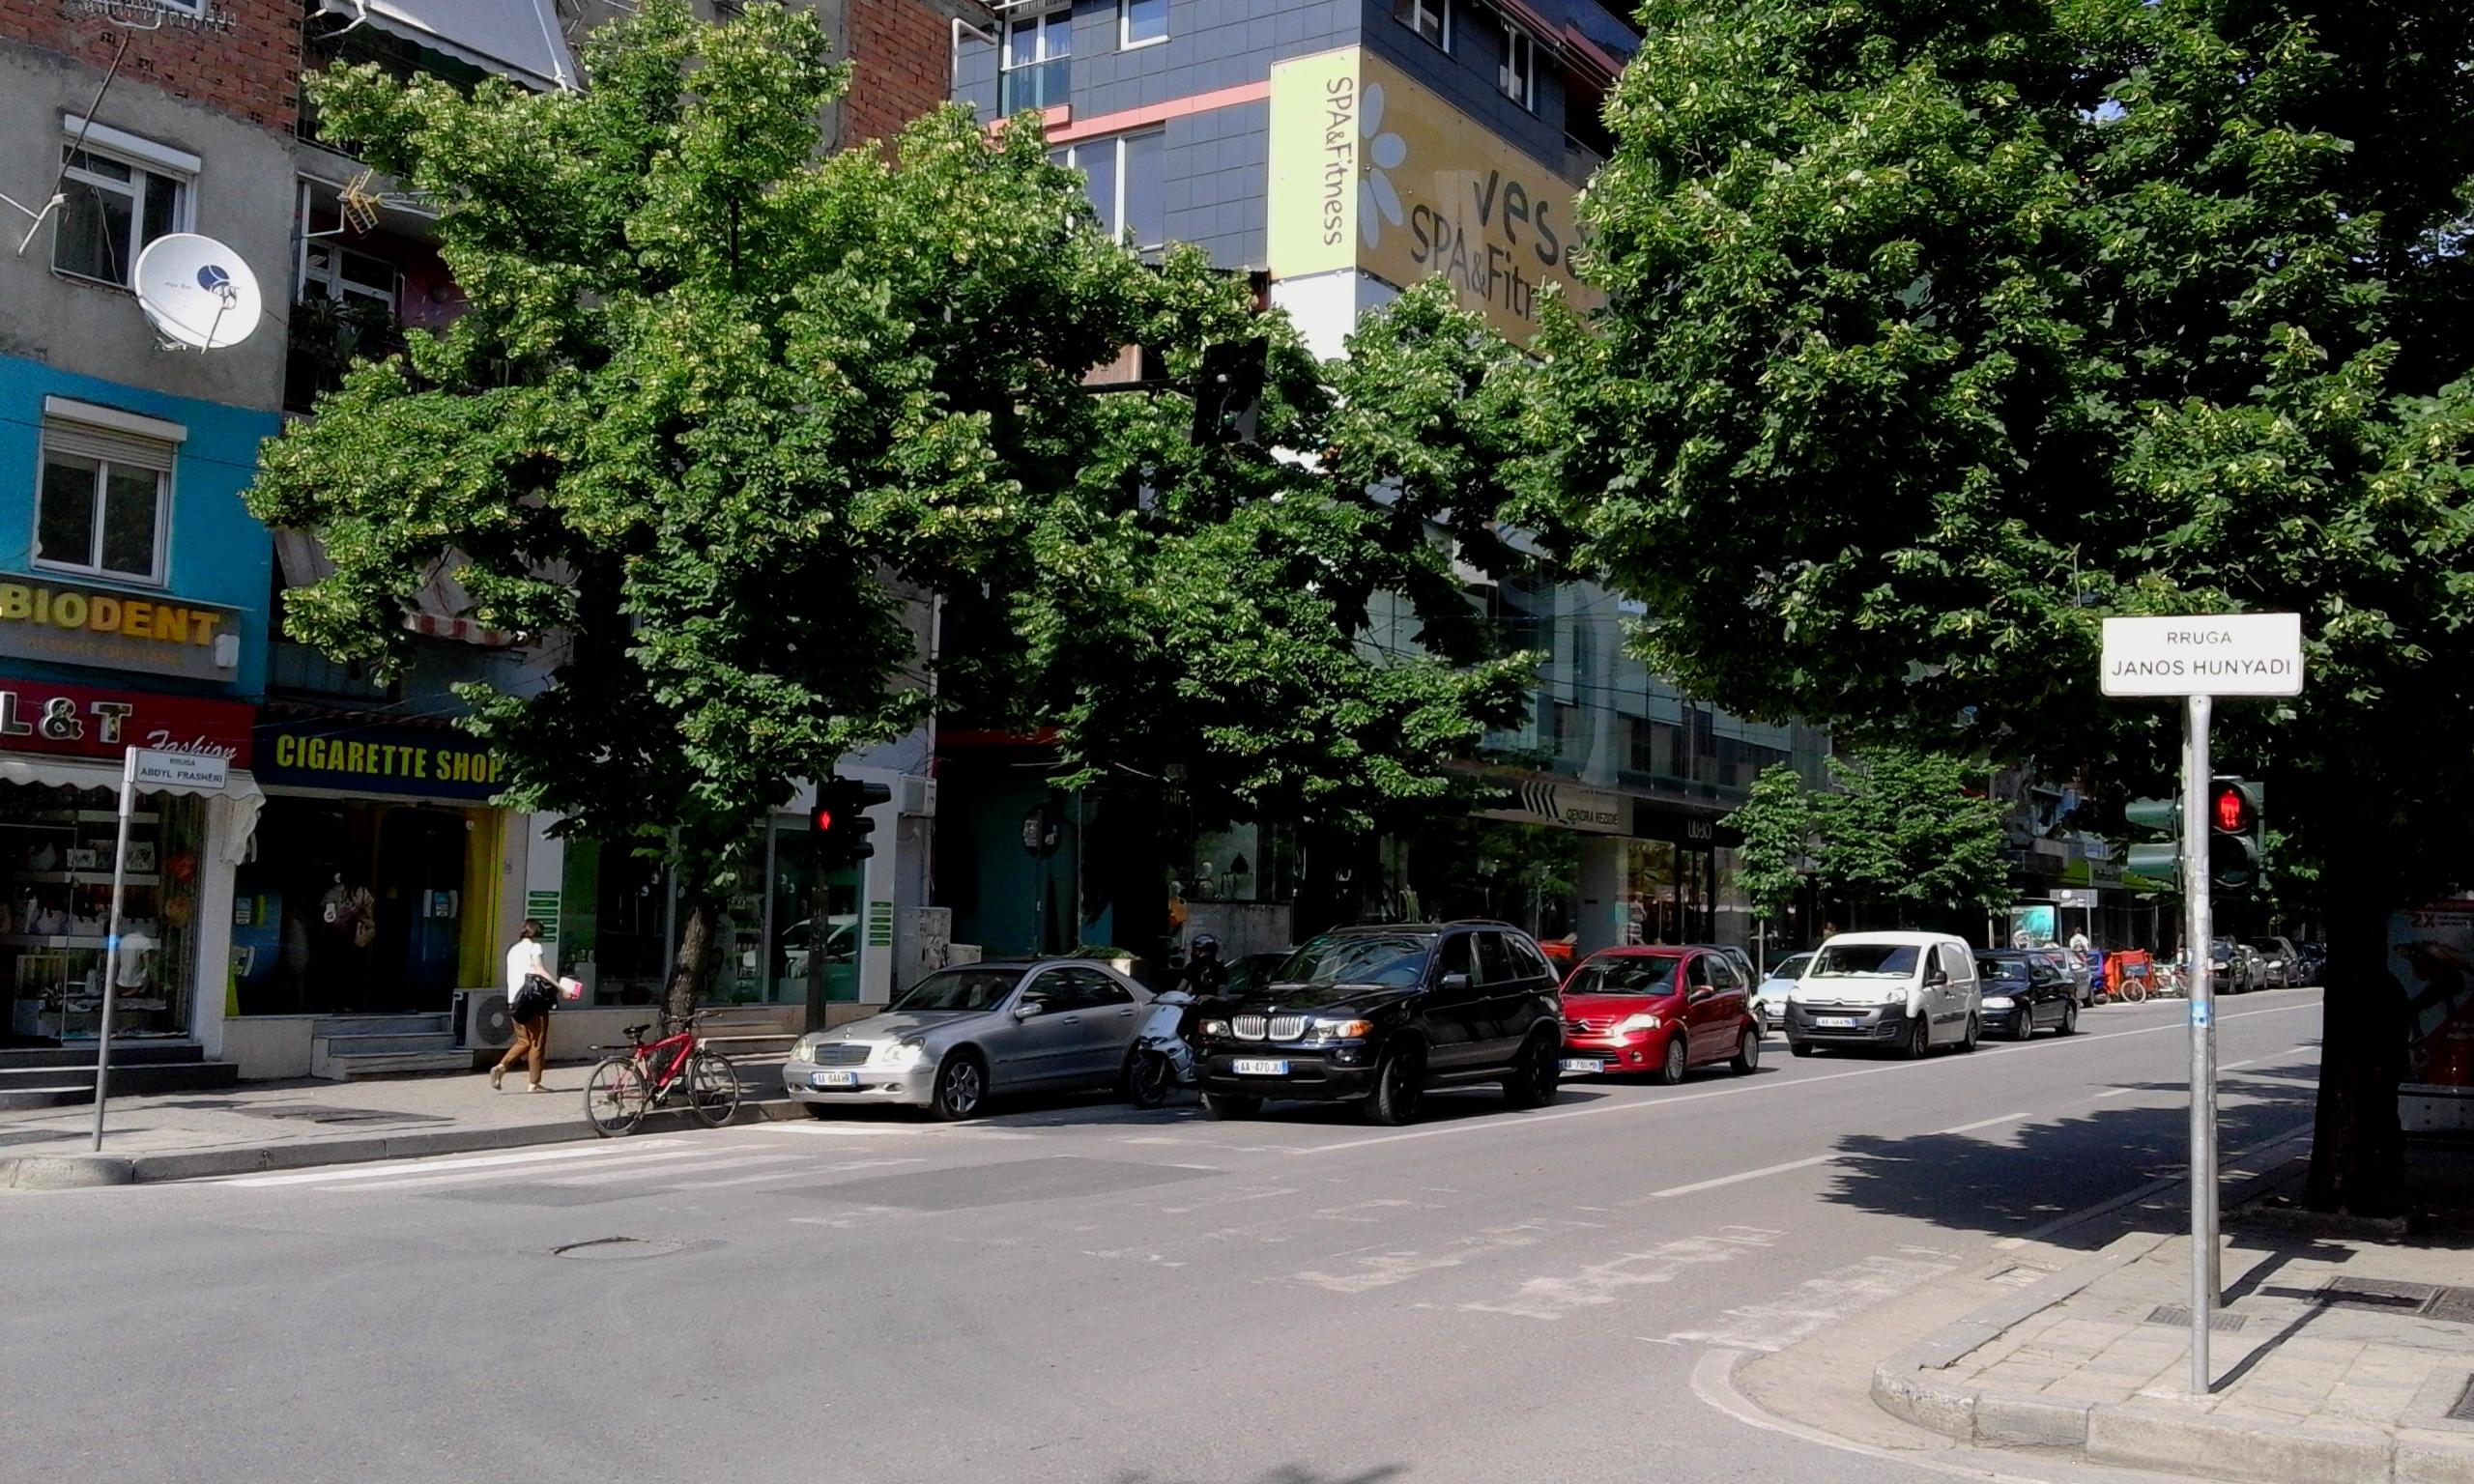 Hunyadi János utca Tiranában (Fotó: Jani haverja)